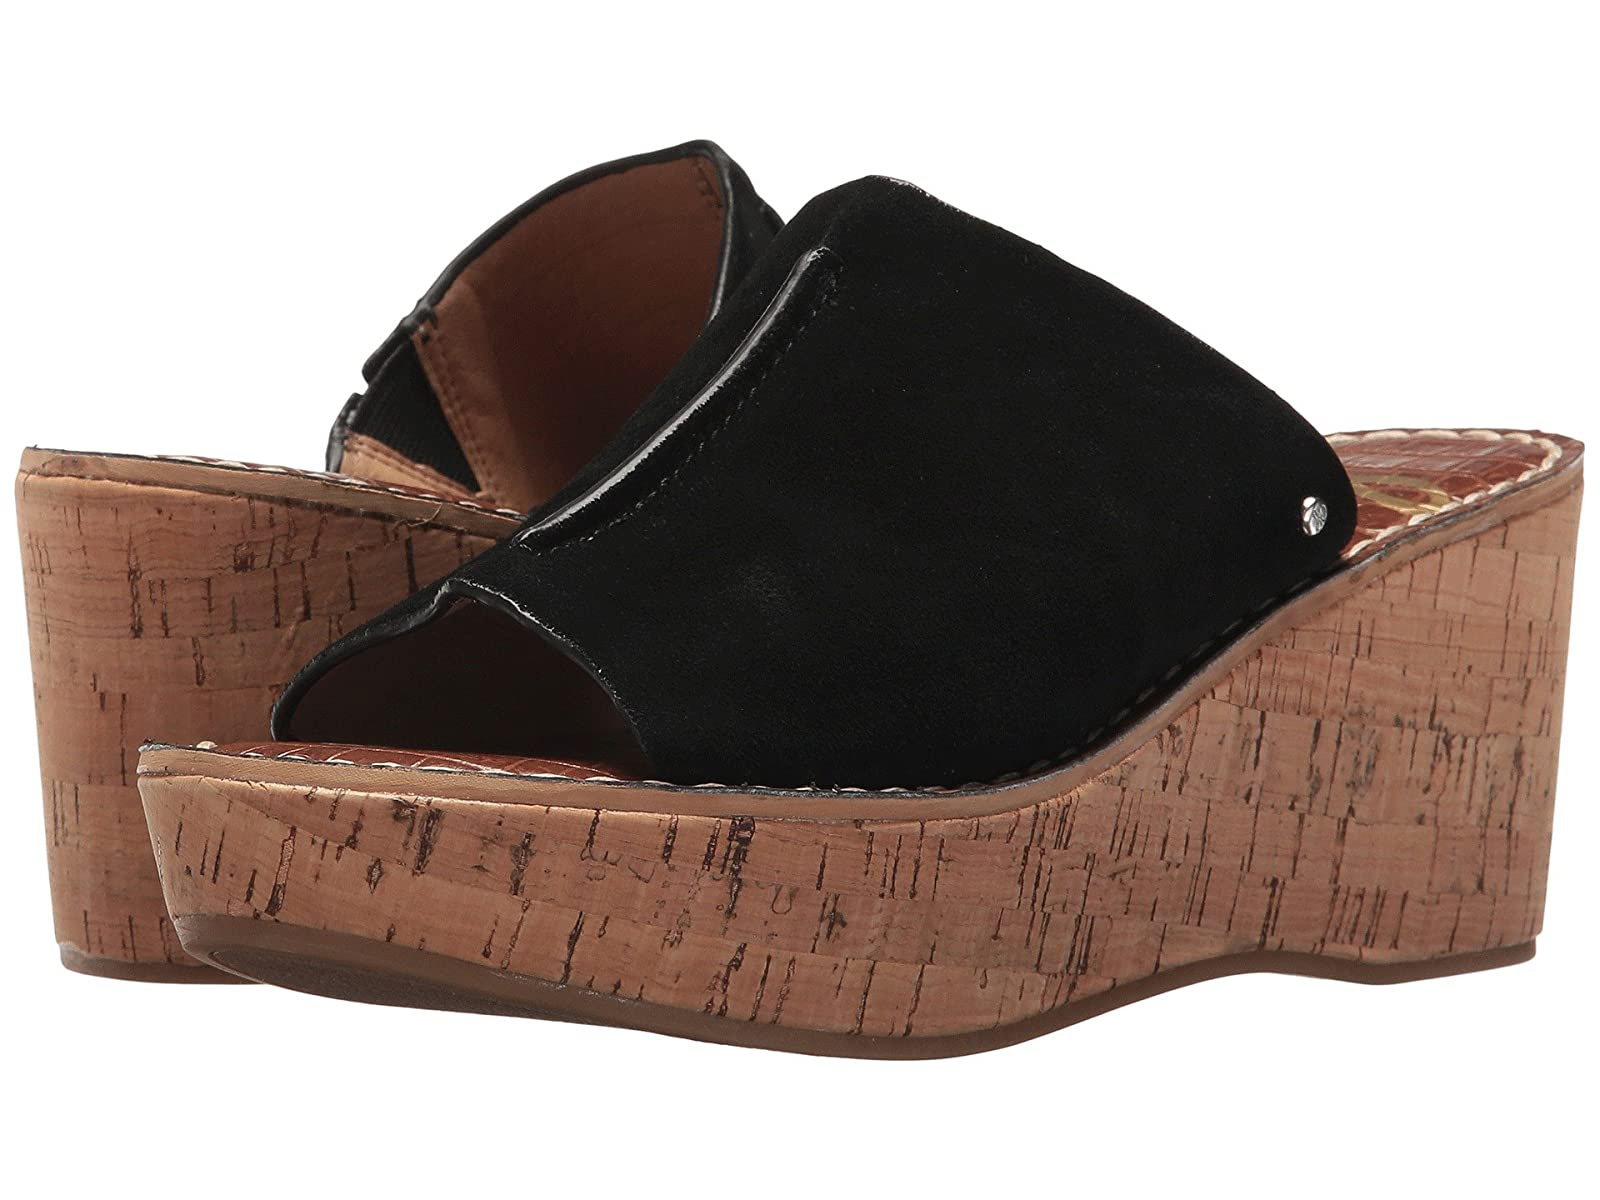 Sam Edelman RangerAtmospheric grades have affordable shoes